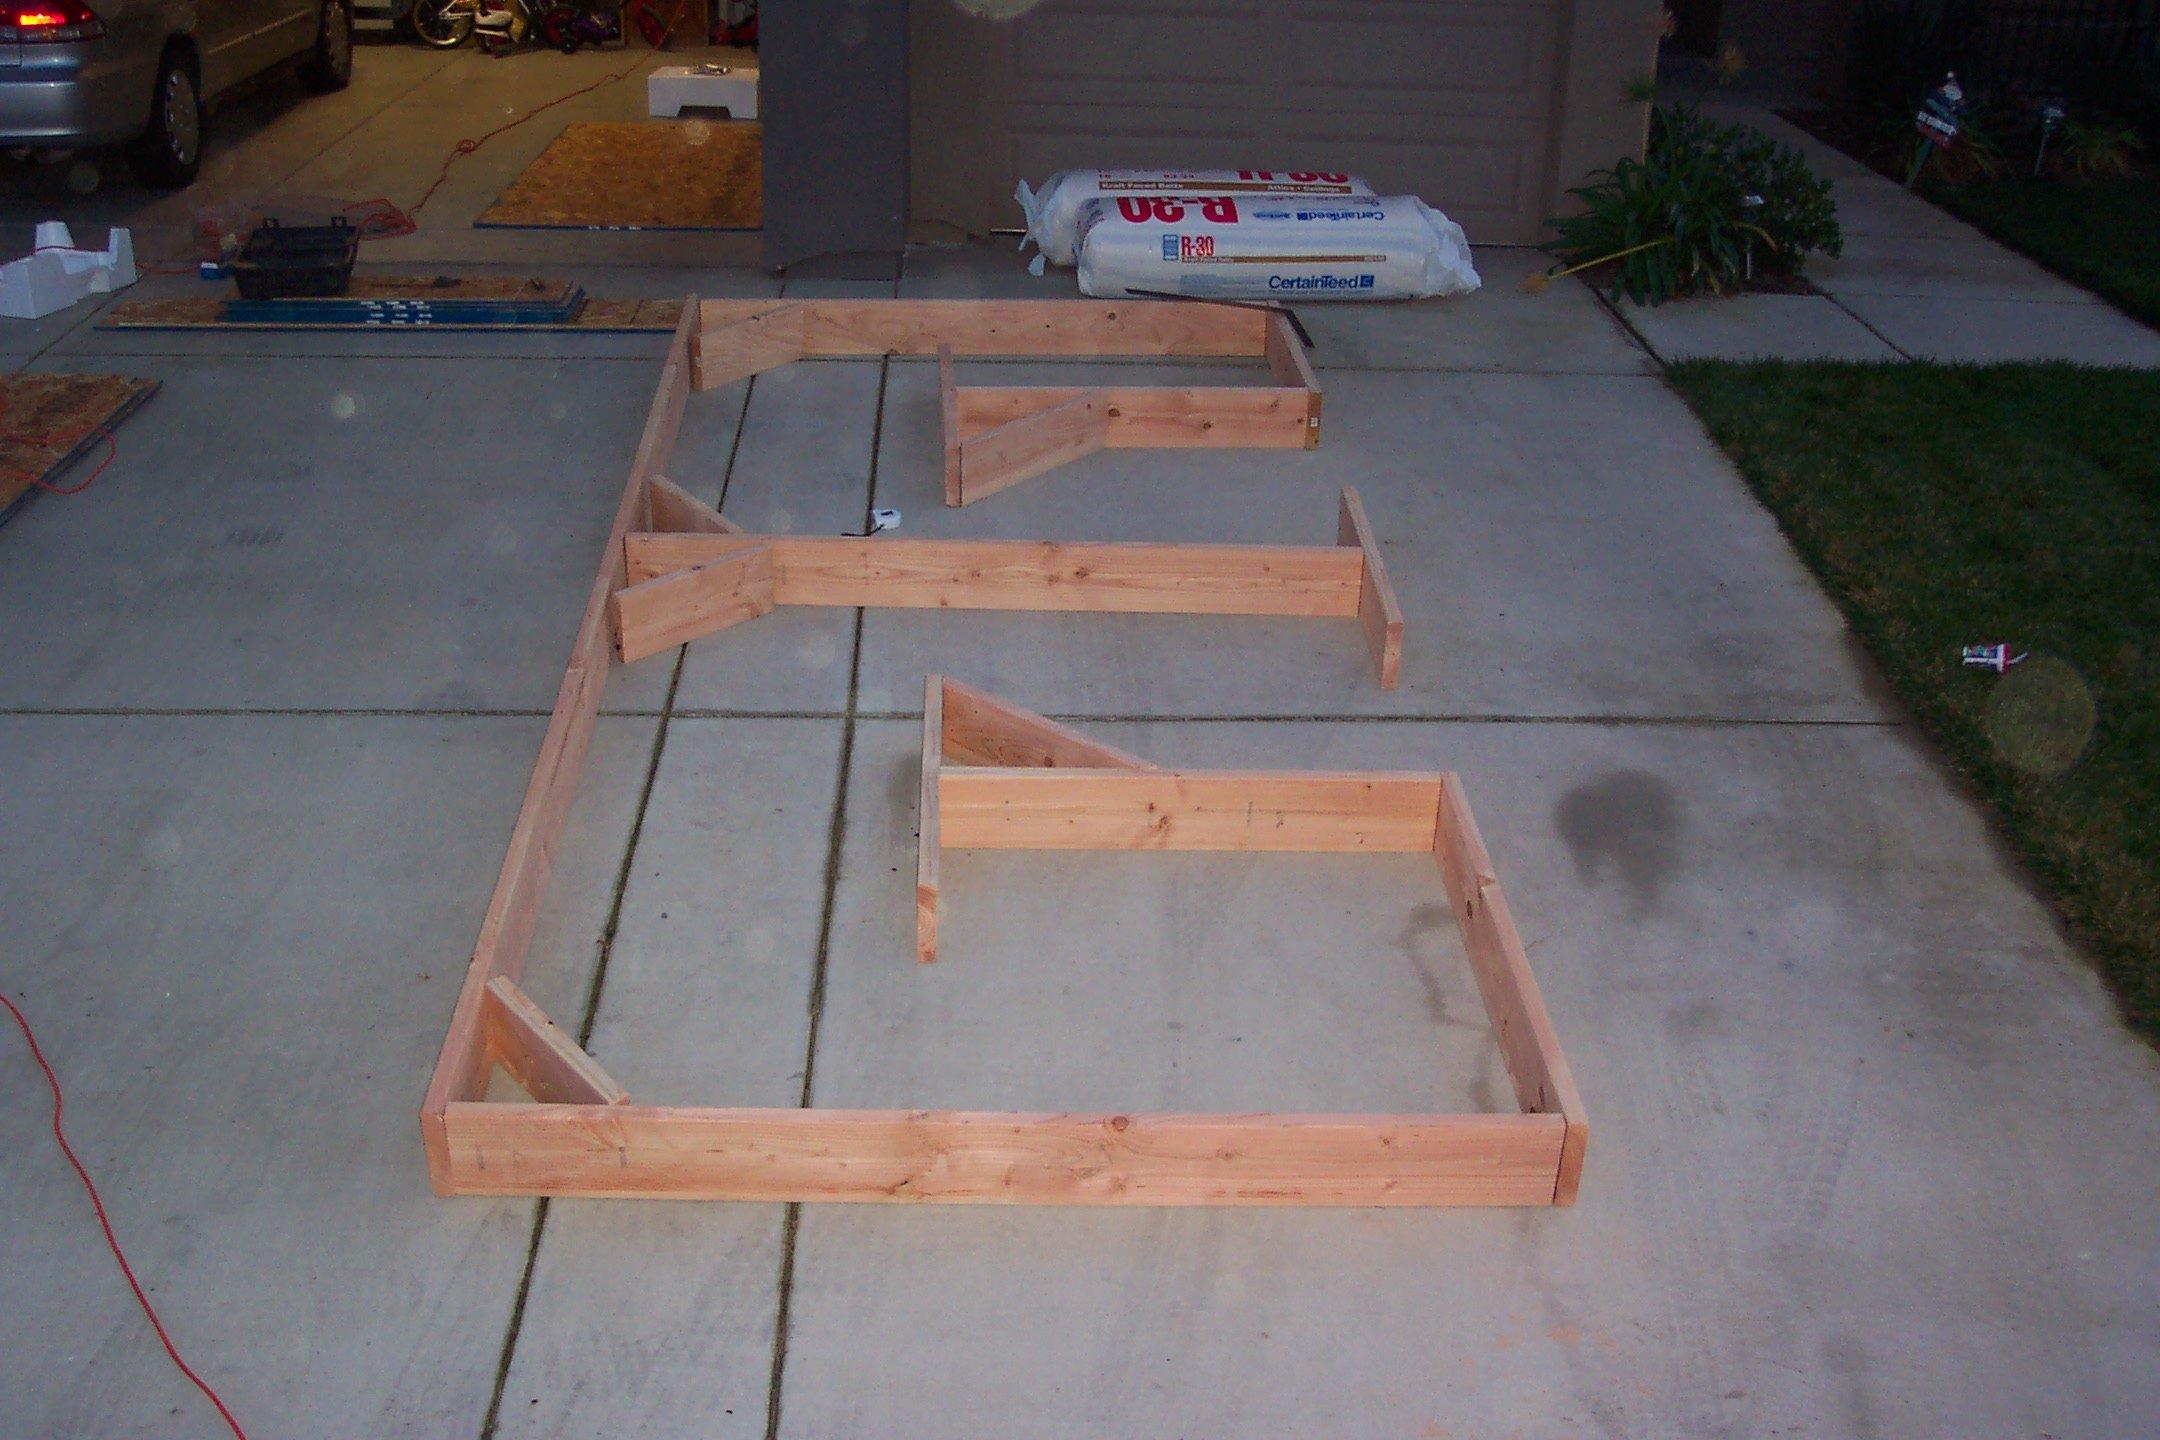 Riser construction 1 - outside